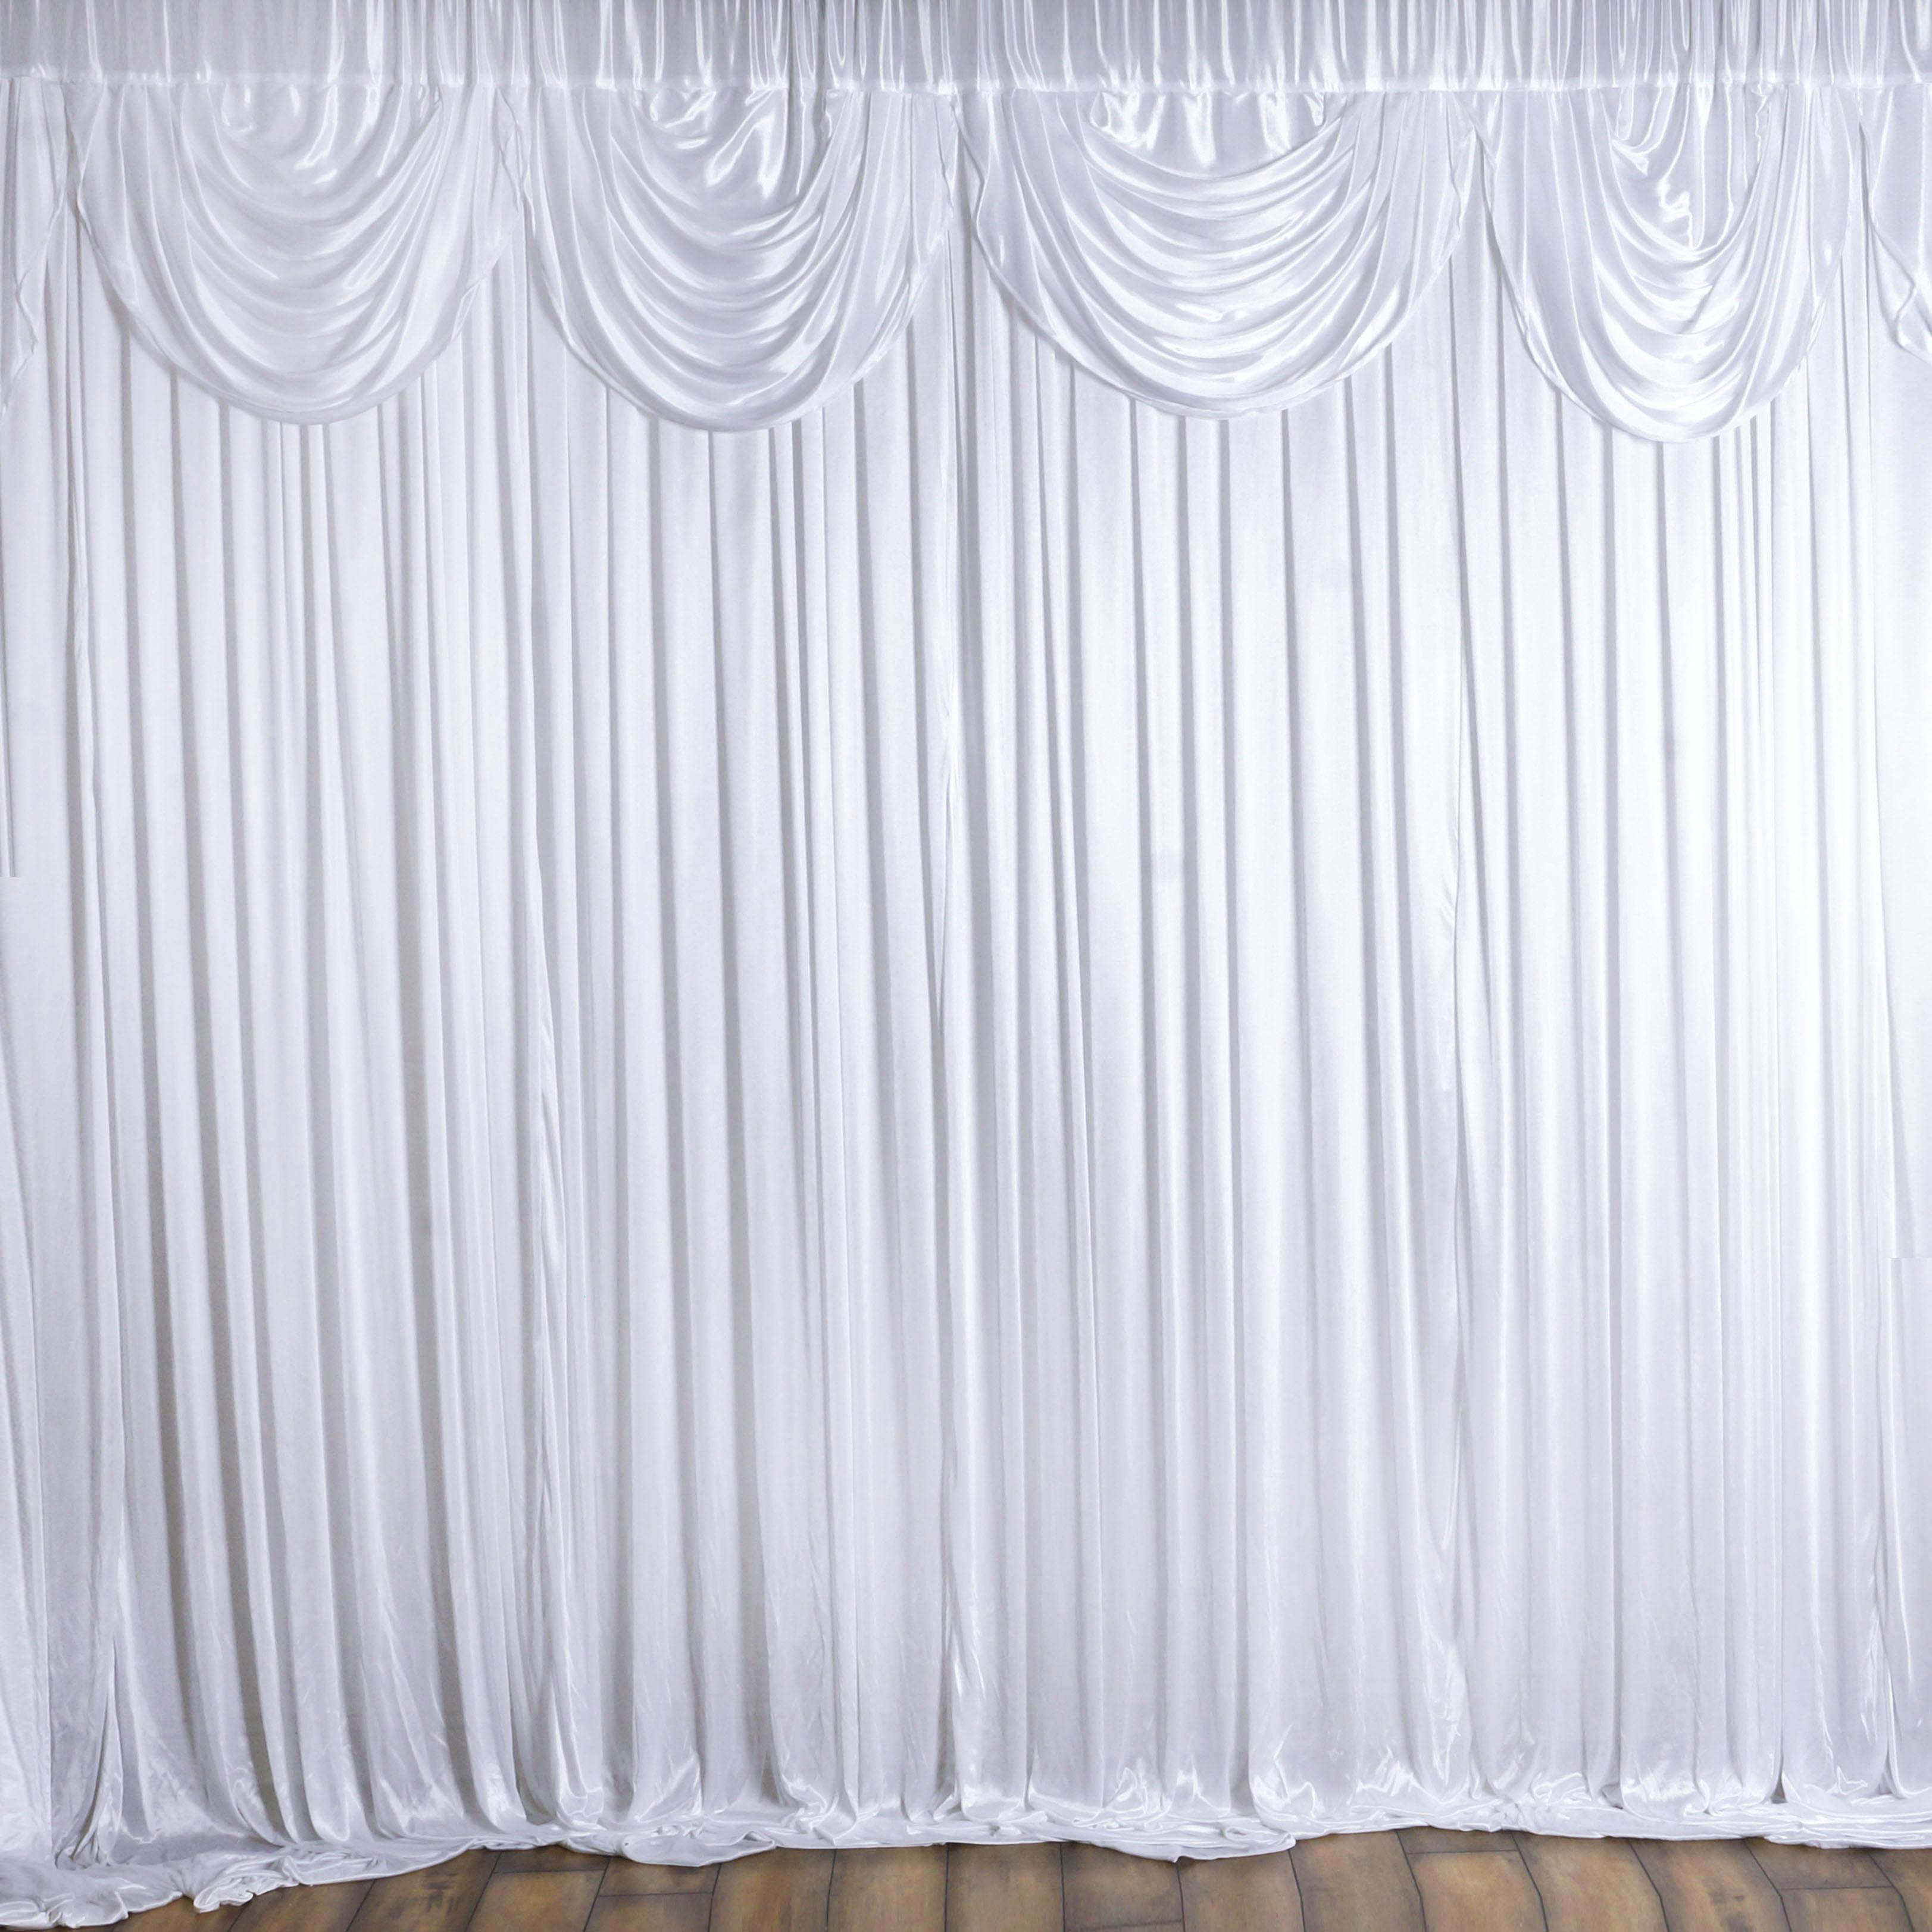 20ft X 10ft White Satin Valance Classic Backdrop Photo